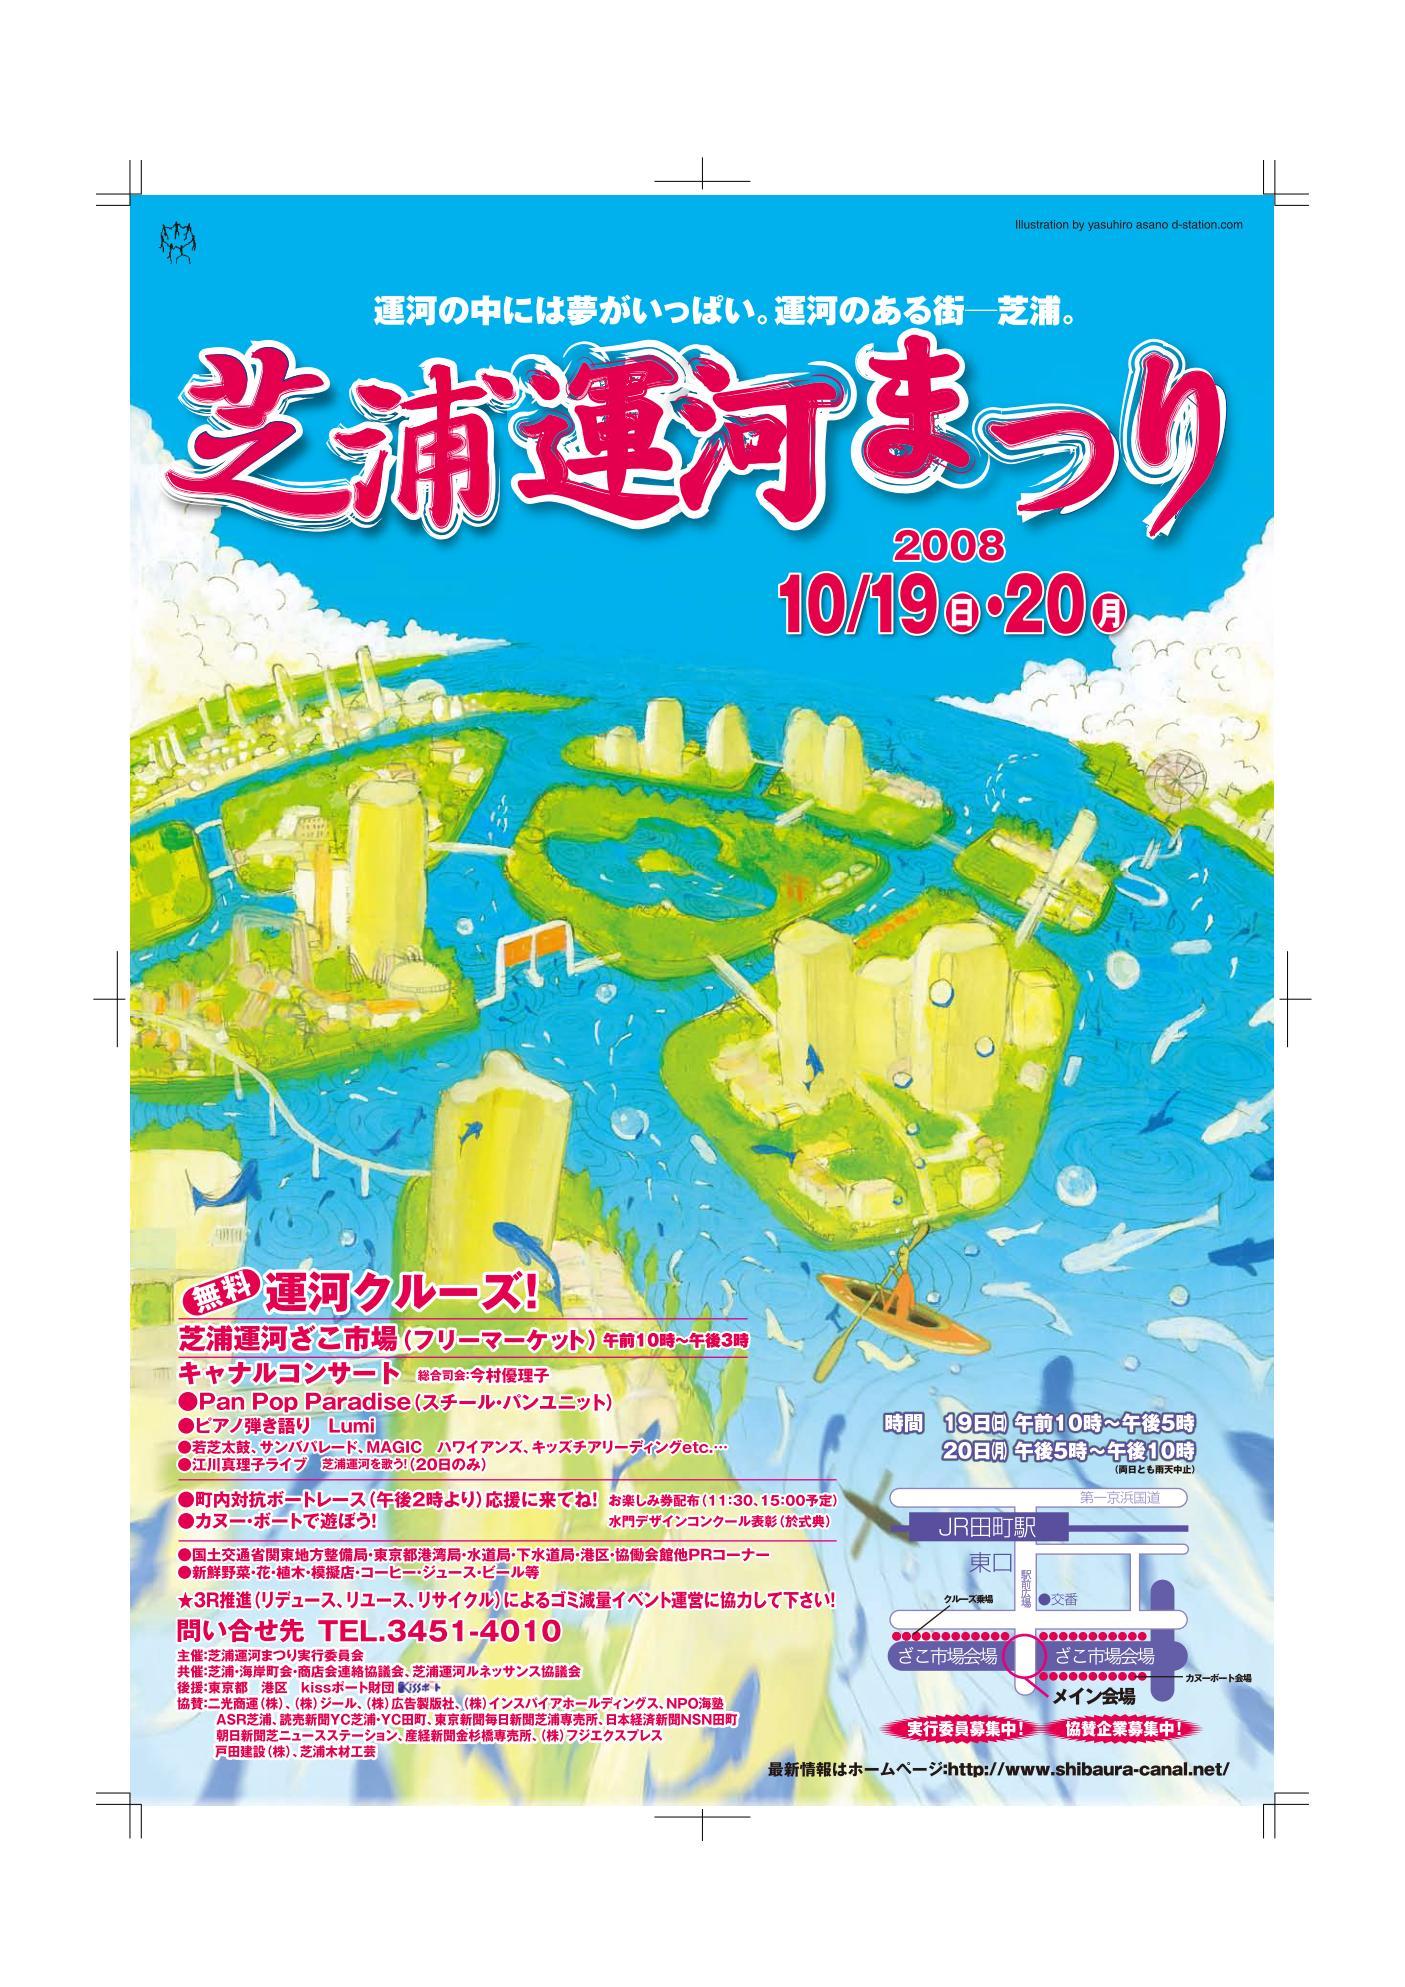 unga2008_poster